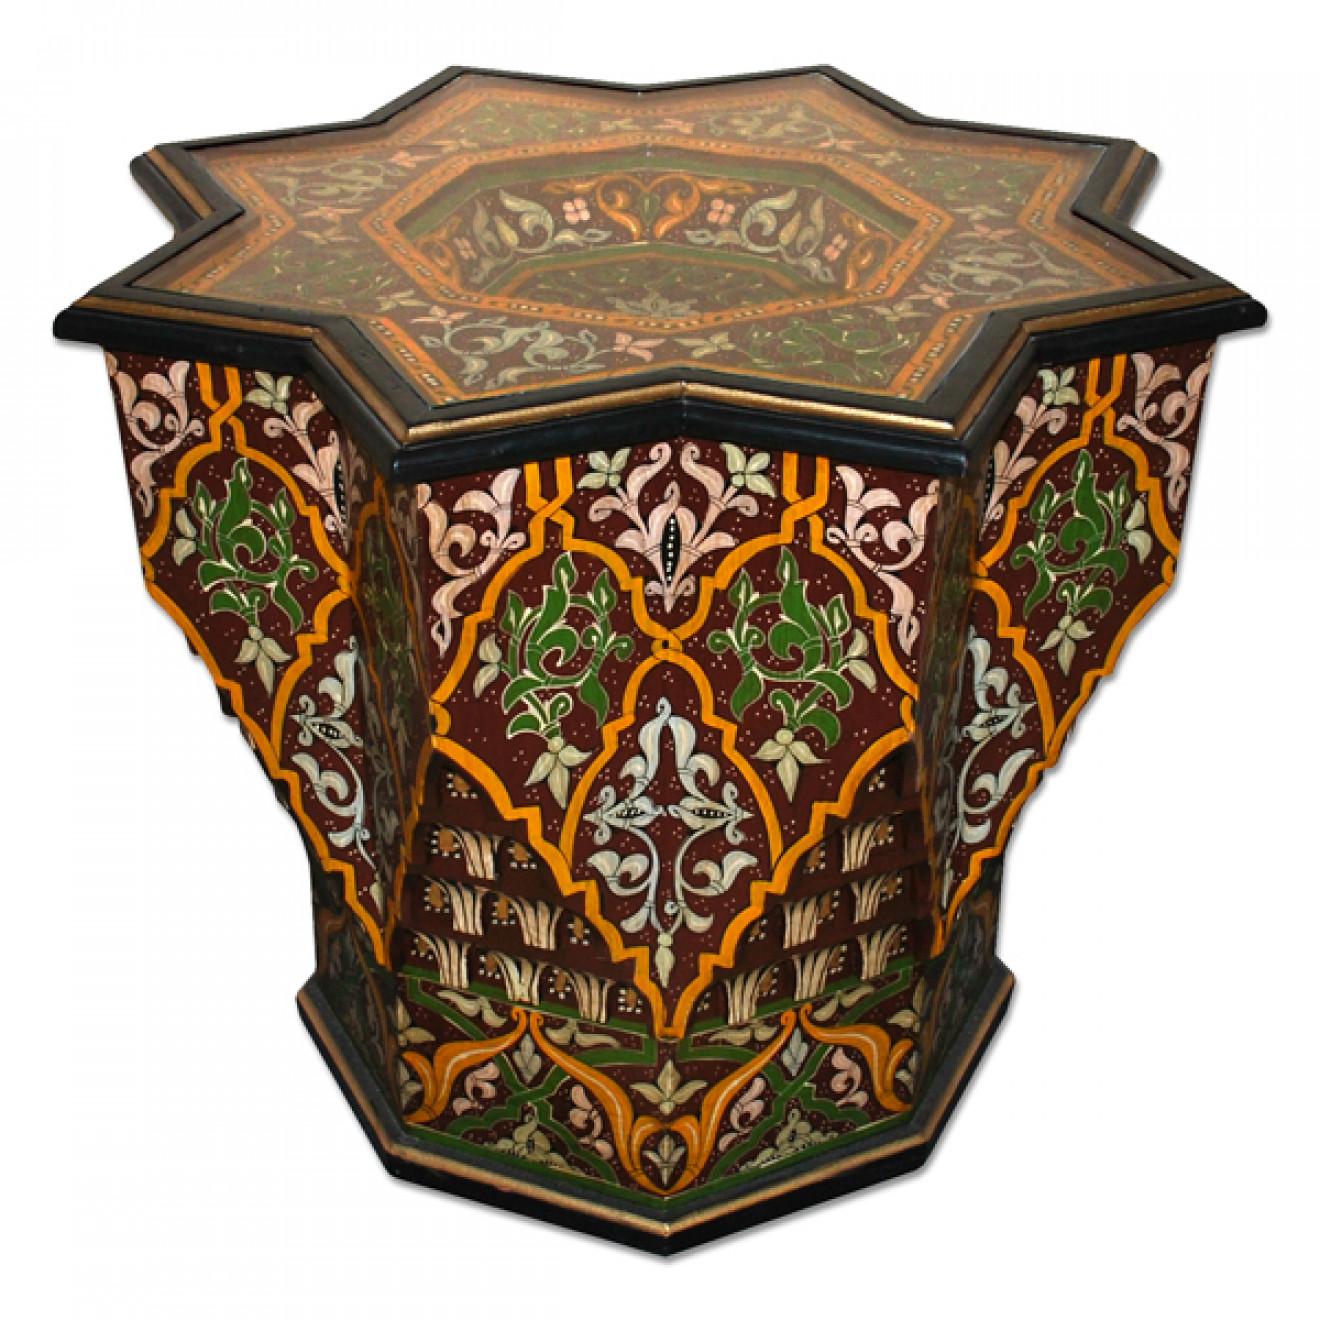 marokko tisch aus holz handbemalen nejma jefna. Black Bedroom Furniture Sets. Home Design Ideas